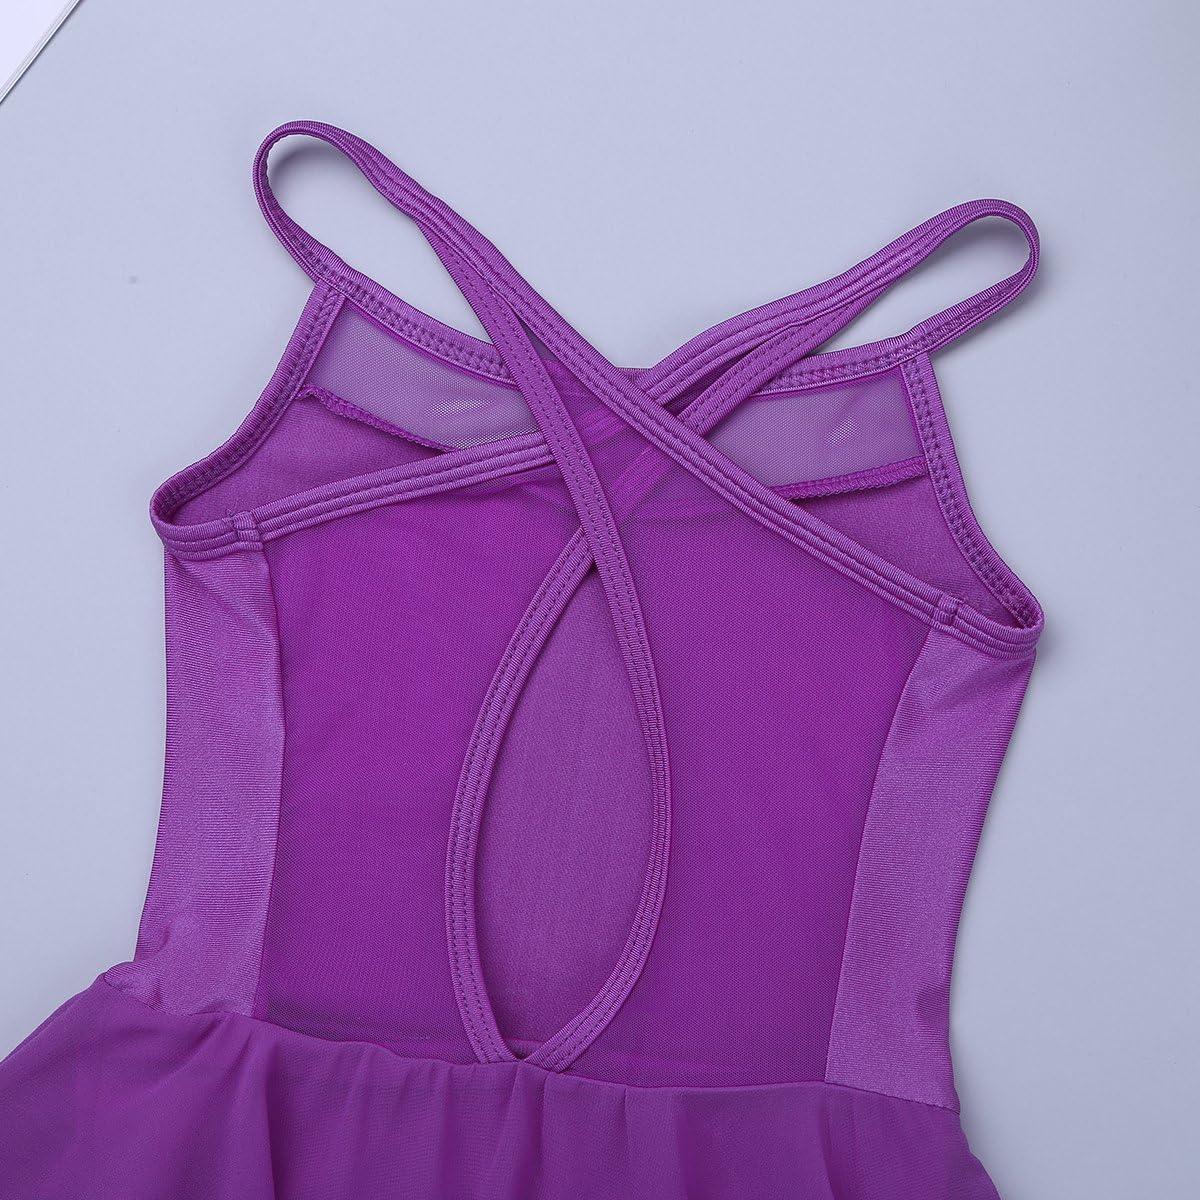 YONGHS Kids Girls Mesh Splice Spaghetti Shoulder Straps Cutout Back Irregular Hem Dance Leotard Dress Modern Dancewear